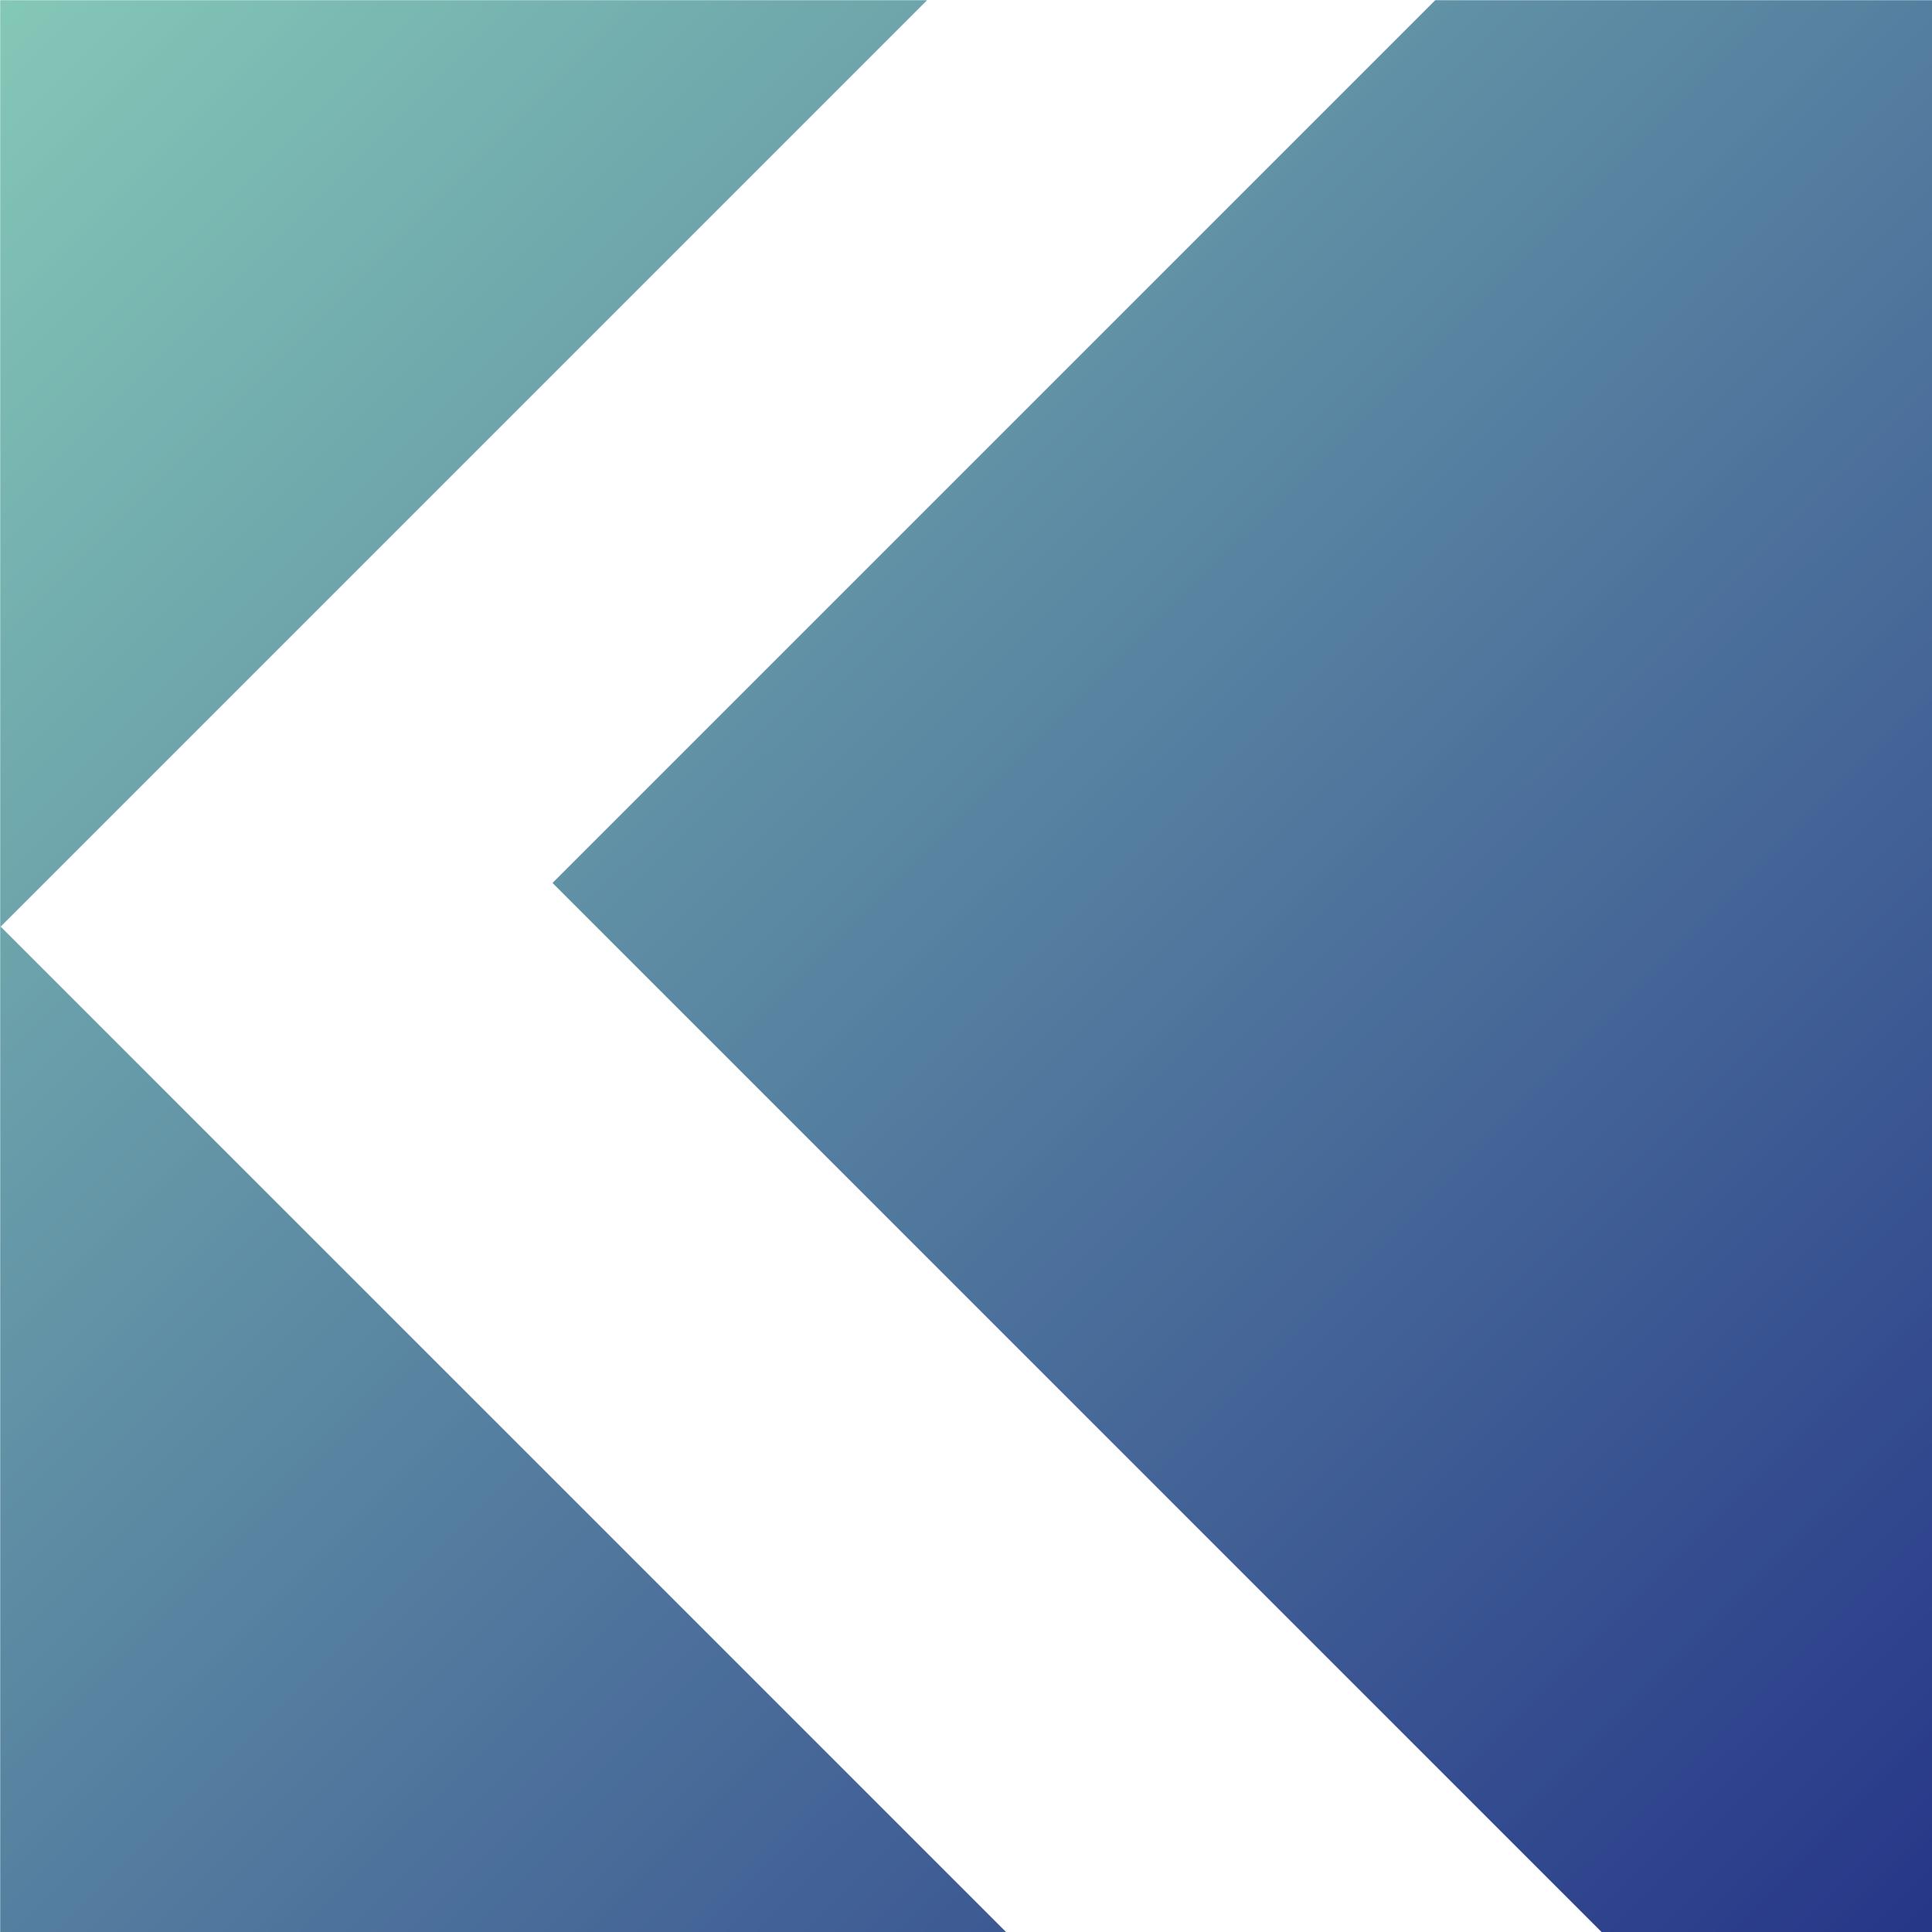 Digital Canvas - Branding for a Digital Creative Agencies for Start-ups